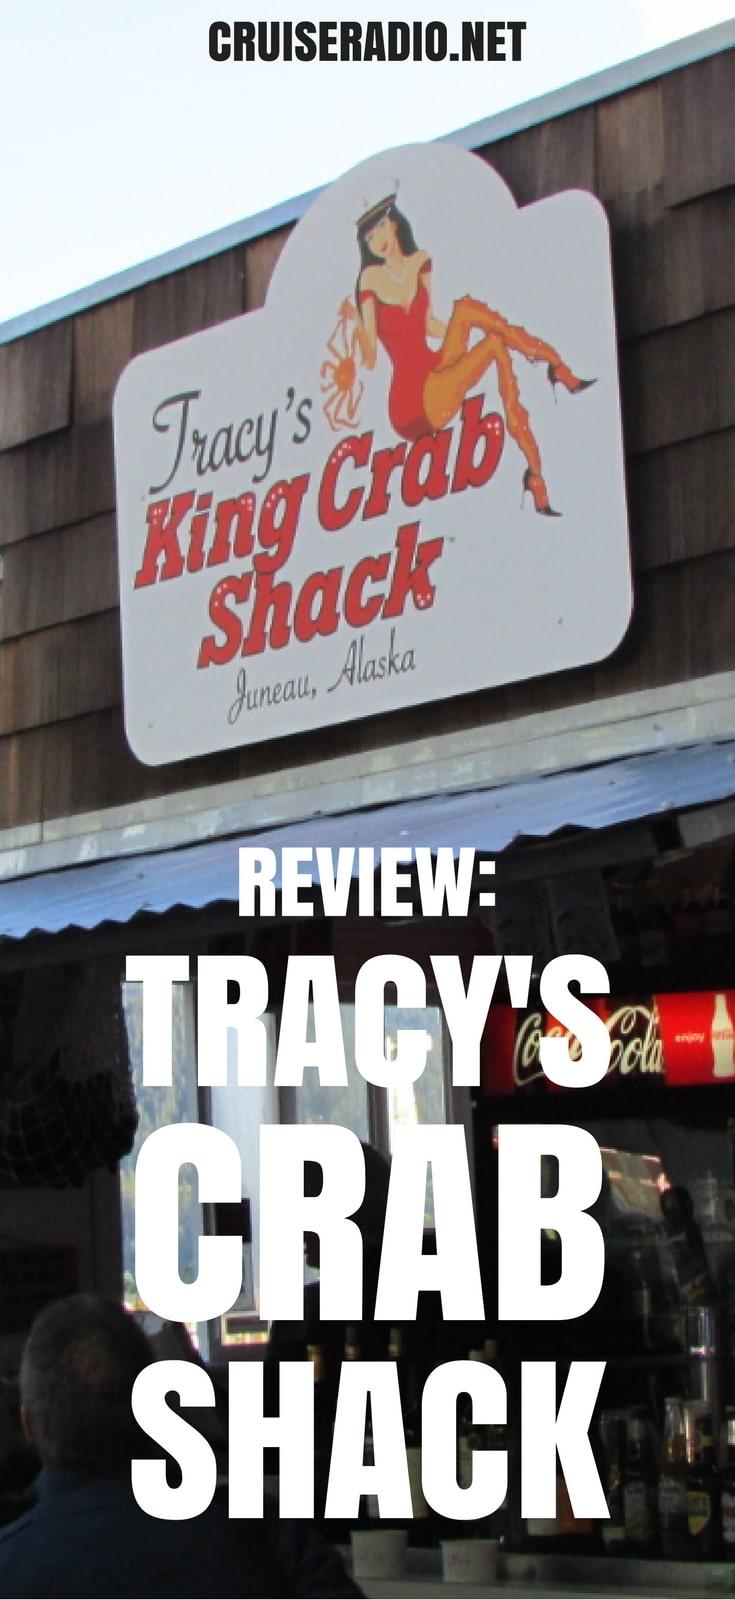 #crabs #seafood #alaska #juneau #cruise #port #cruising #travel #adventure #food #yum